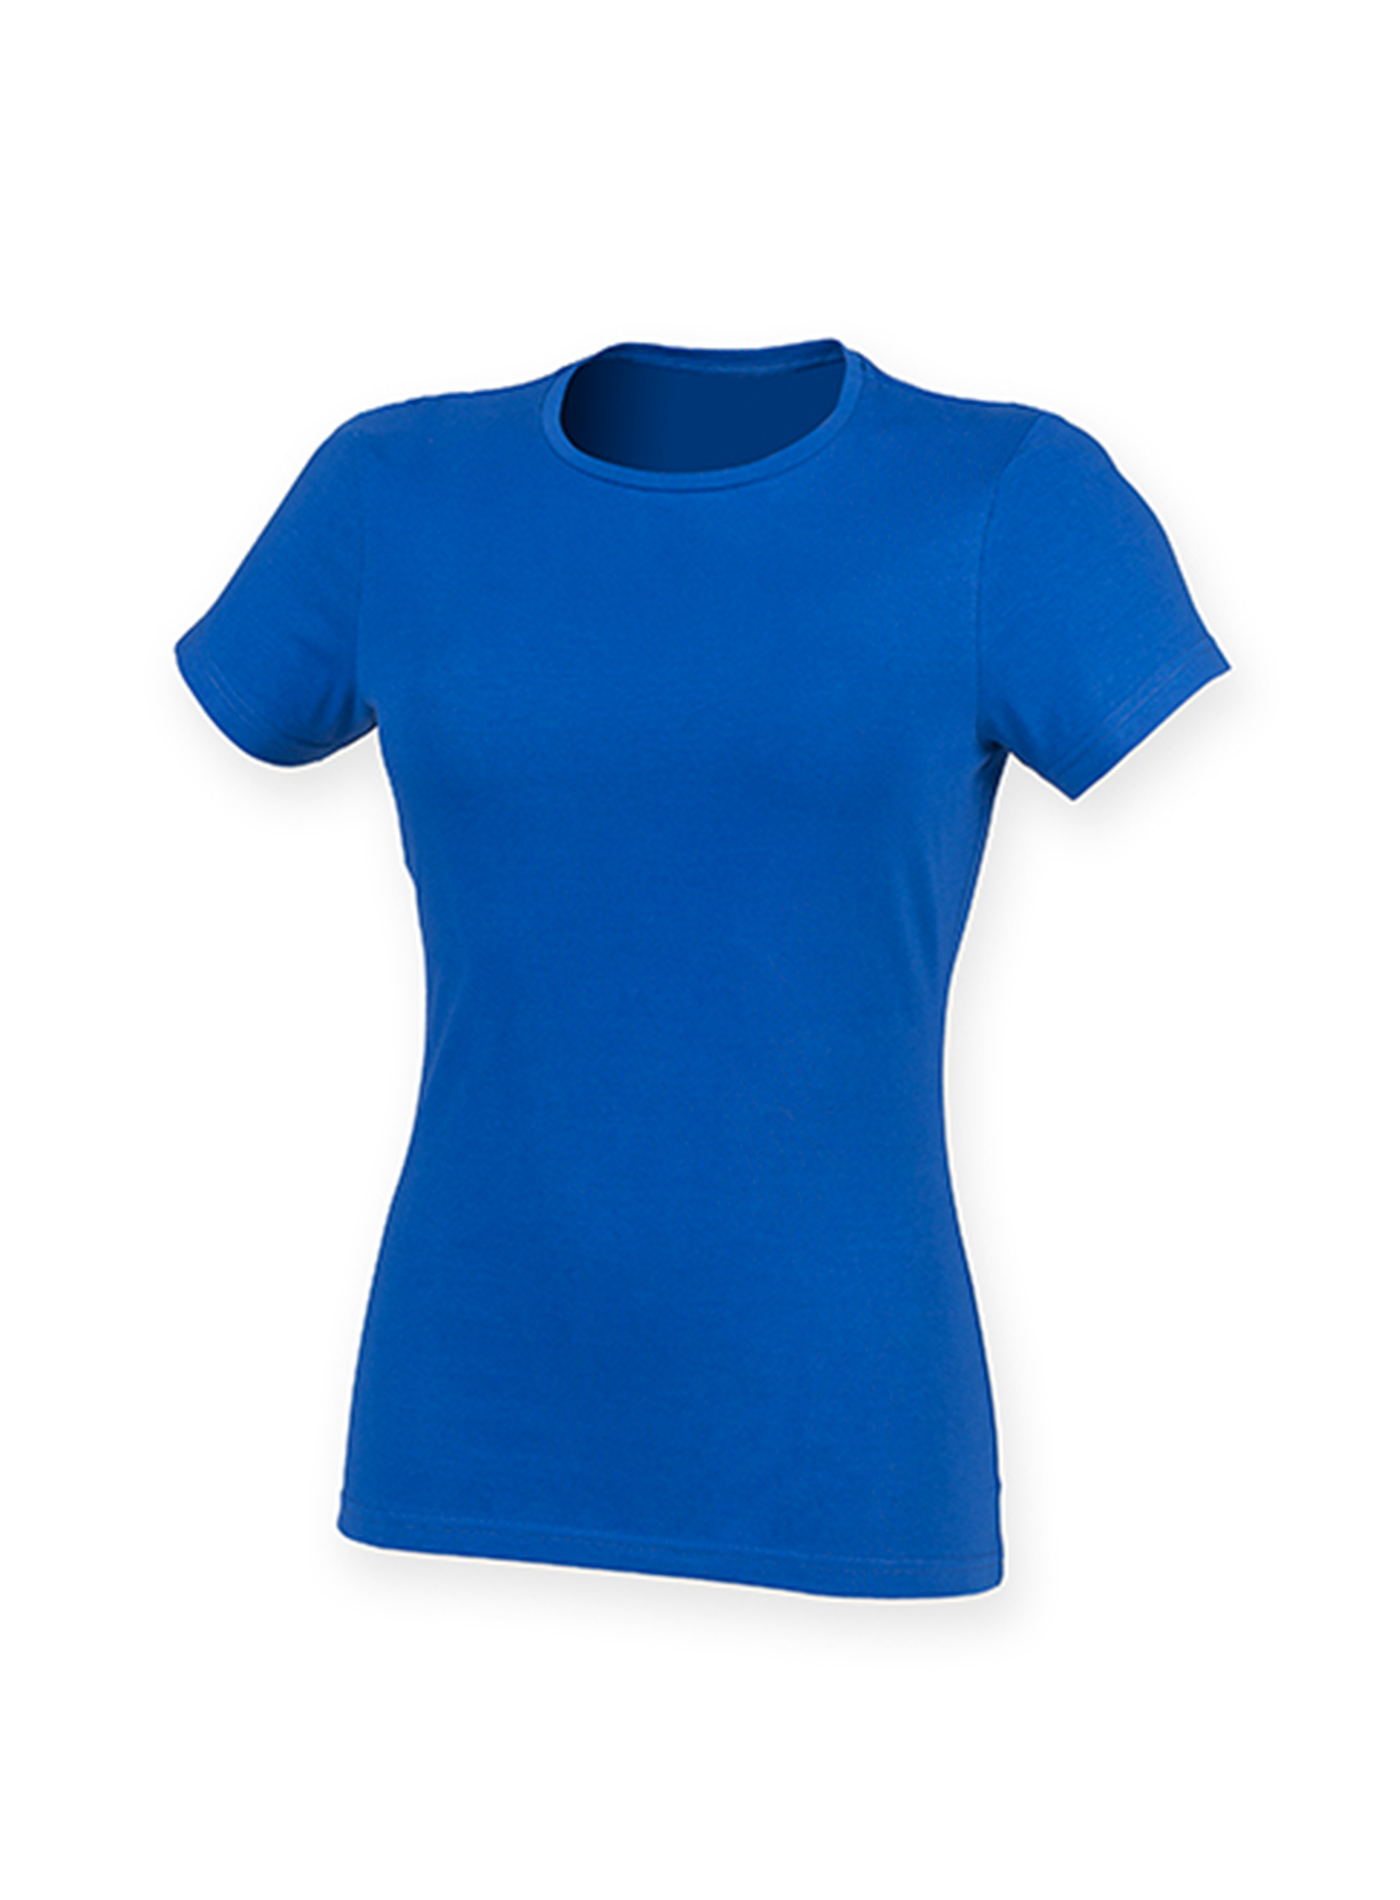 Dámské strečové tričko Feels Good - Královská modrá XXL